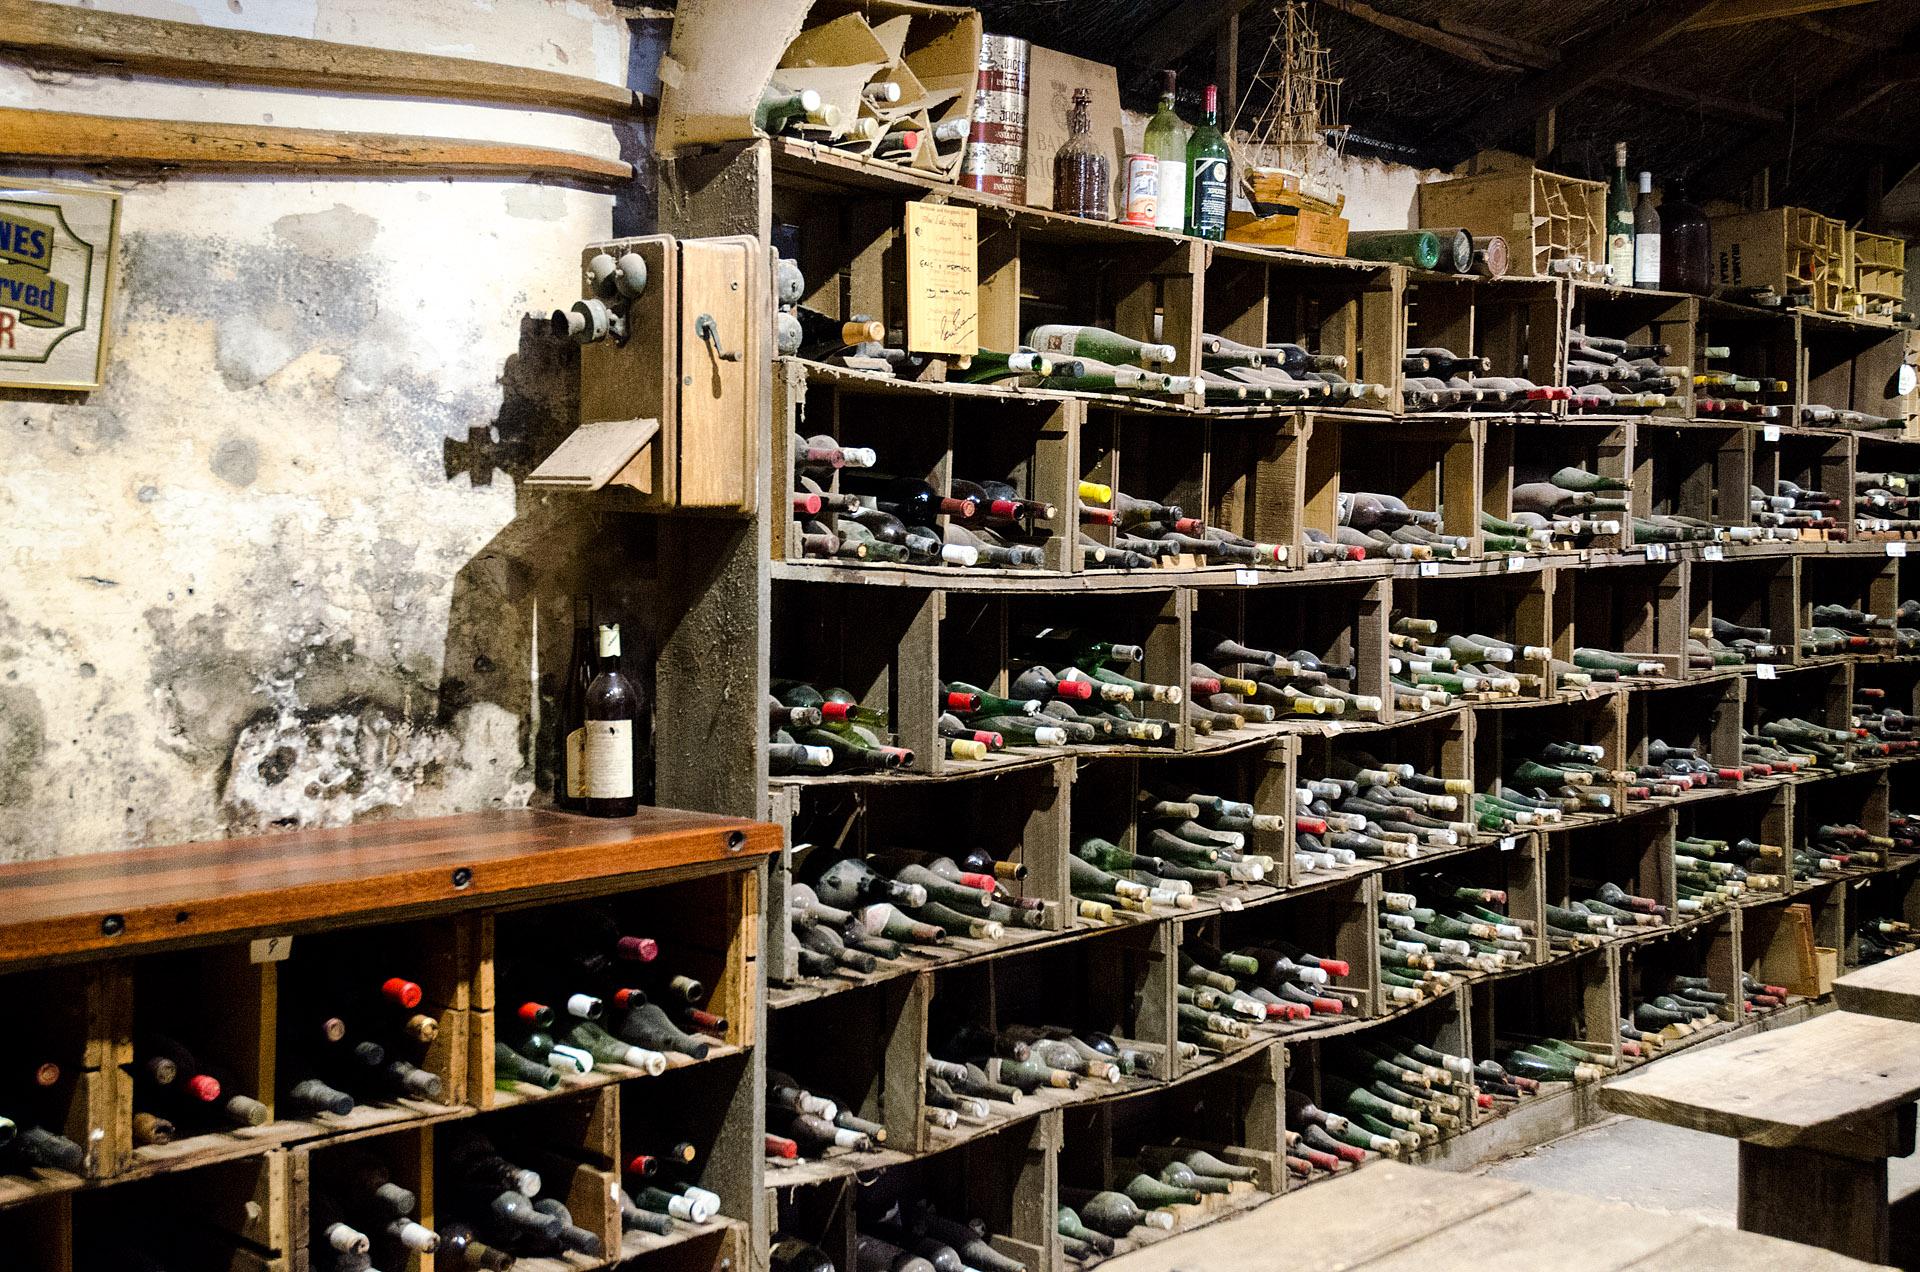 Brand's limestone cellar